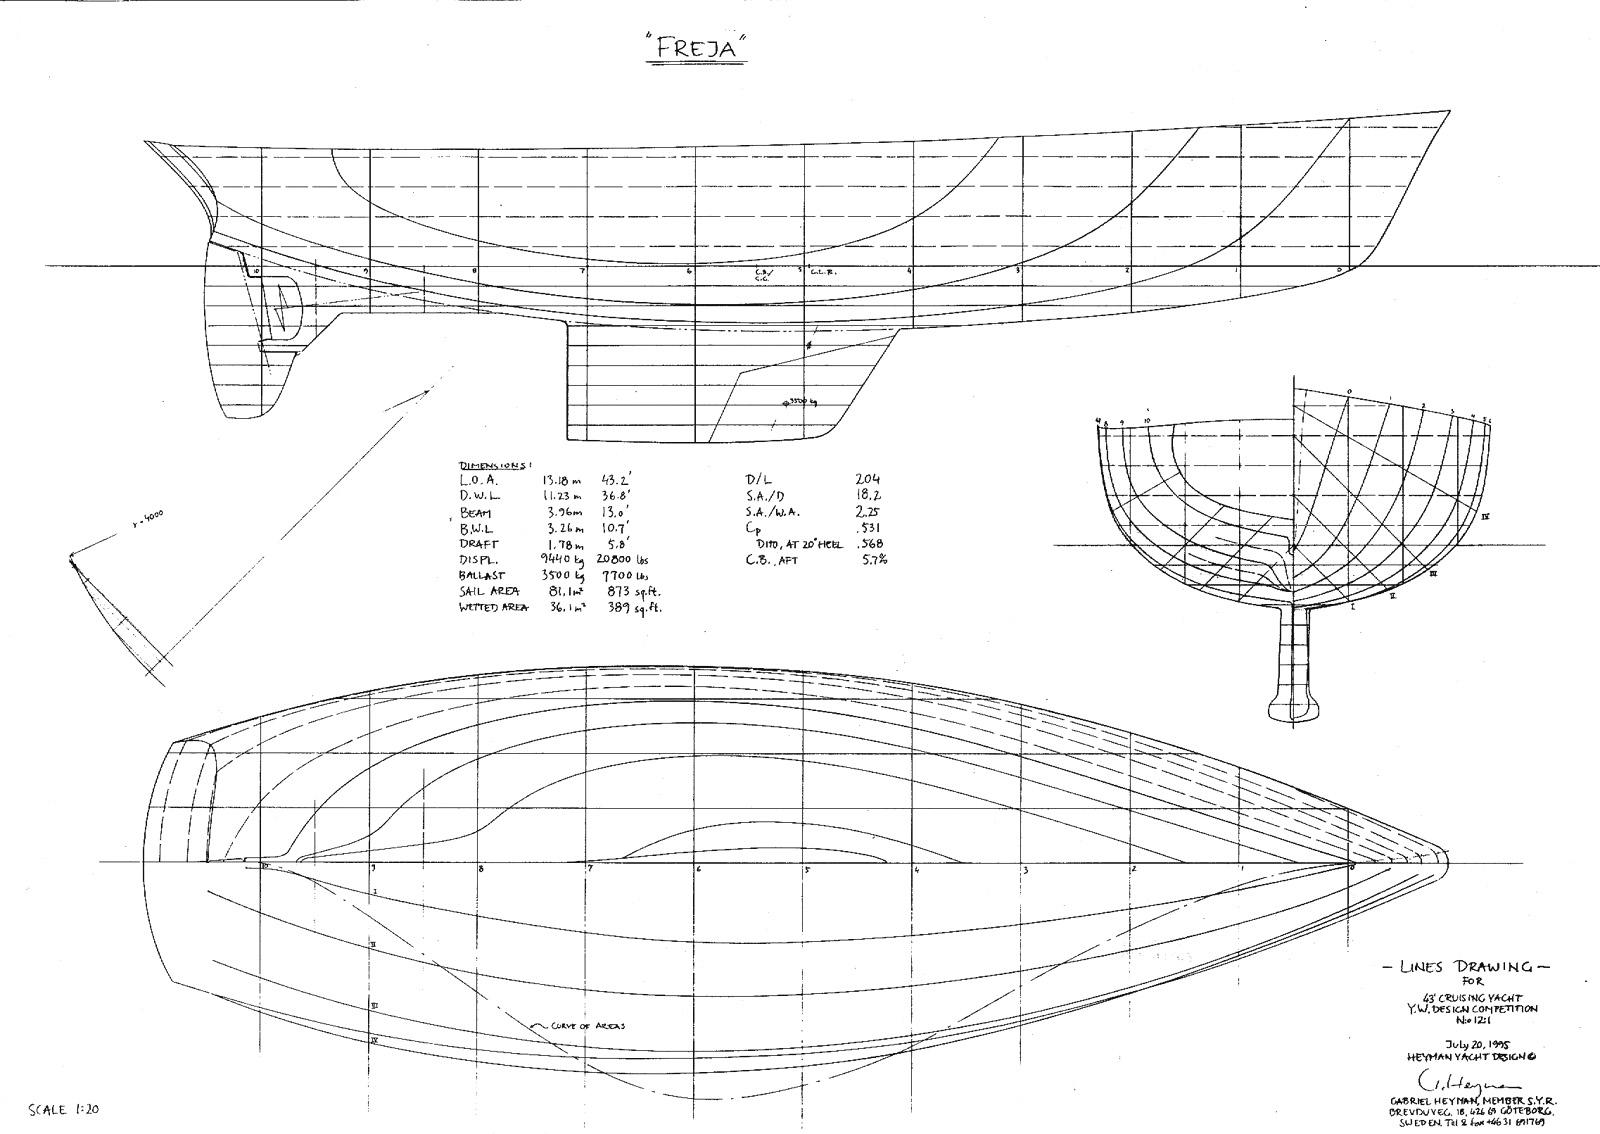 43' Freja, lines drawing